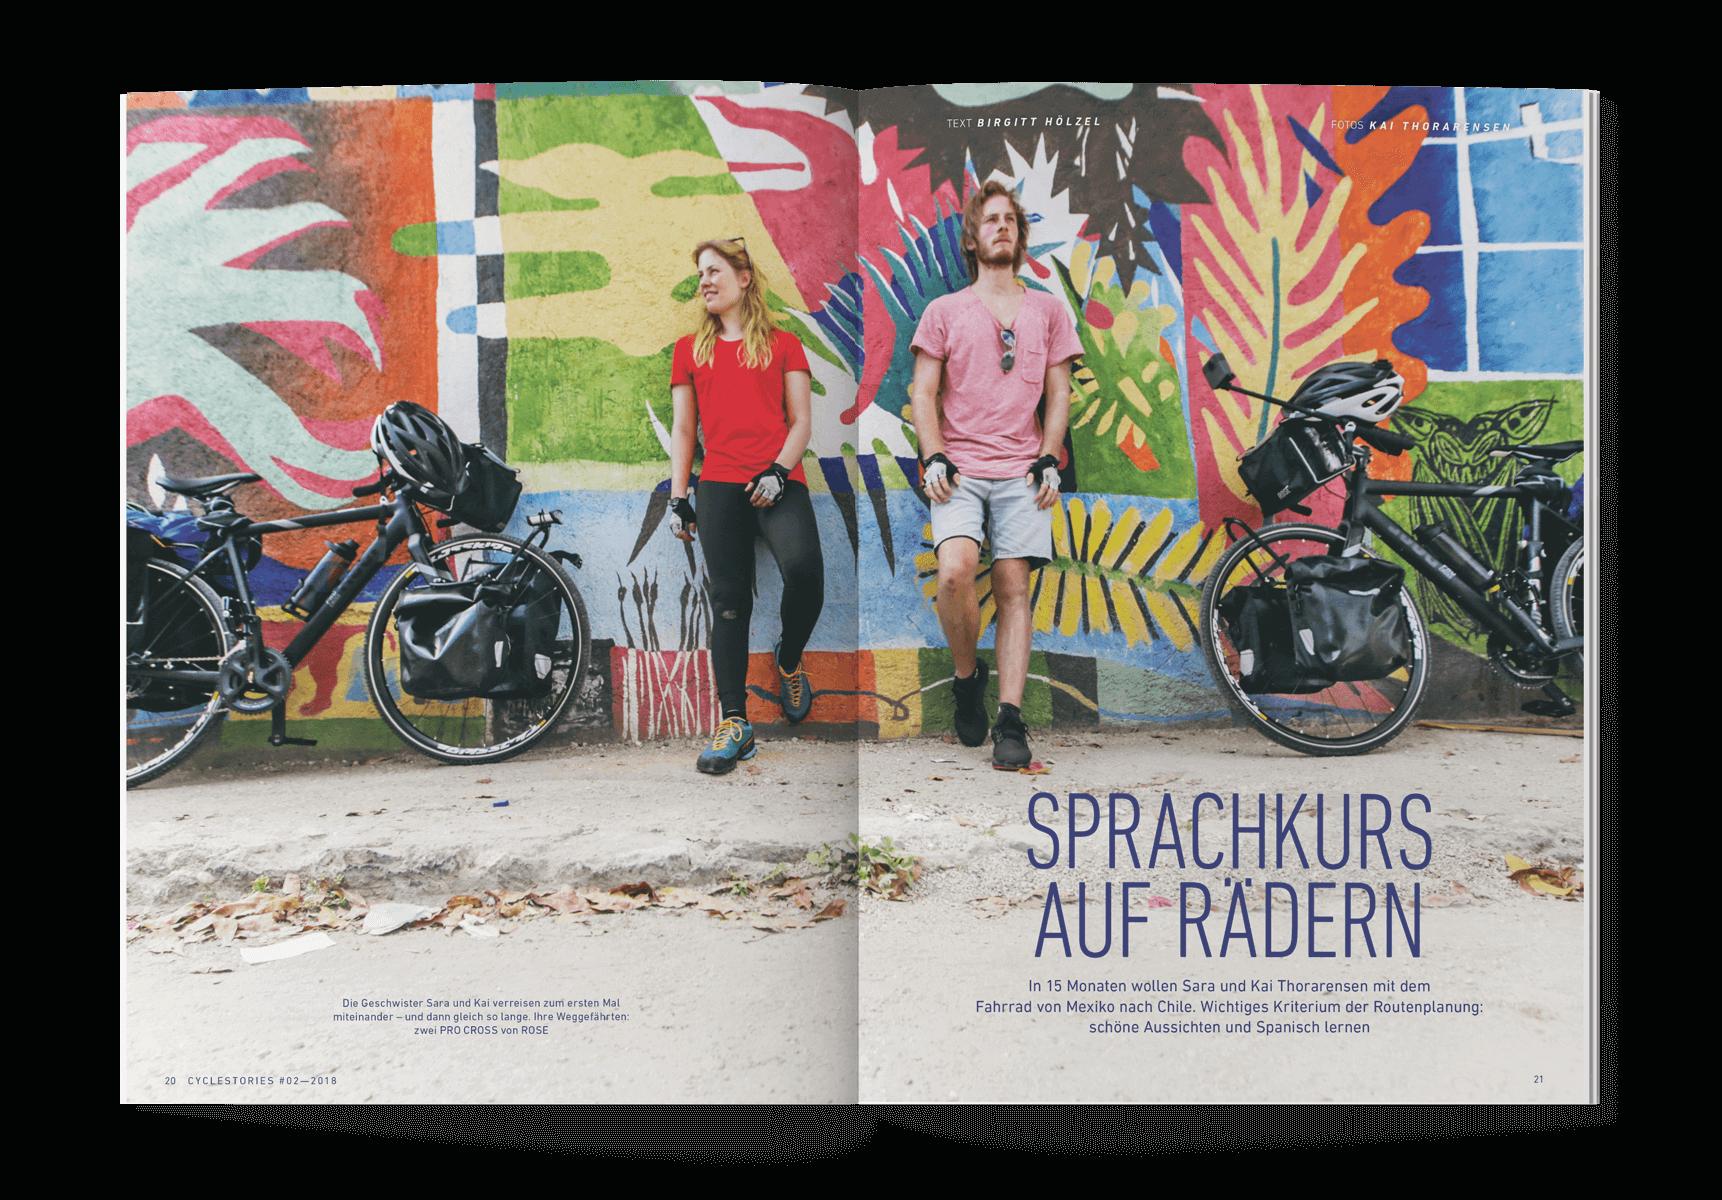 Luckyluu_ROSE_Cyclestories_suedamerika